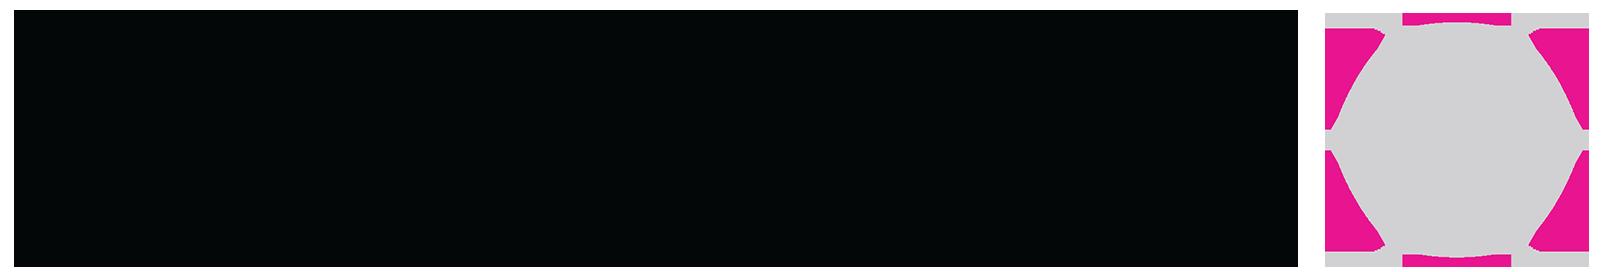 DANYXL_logo.png